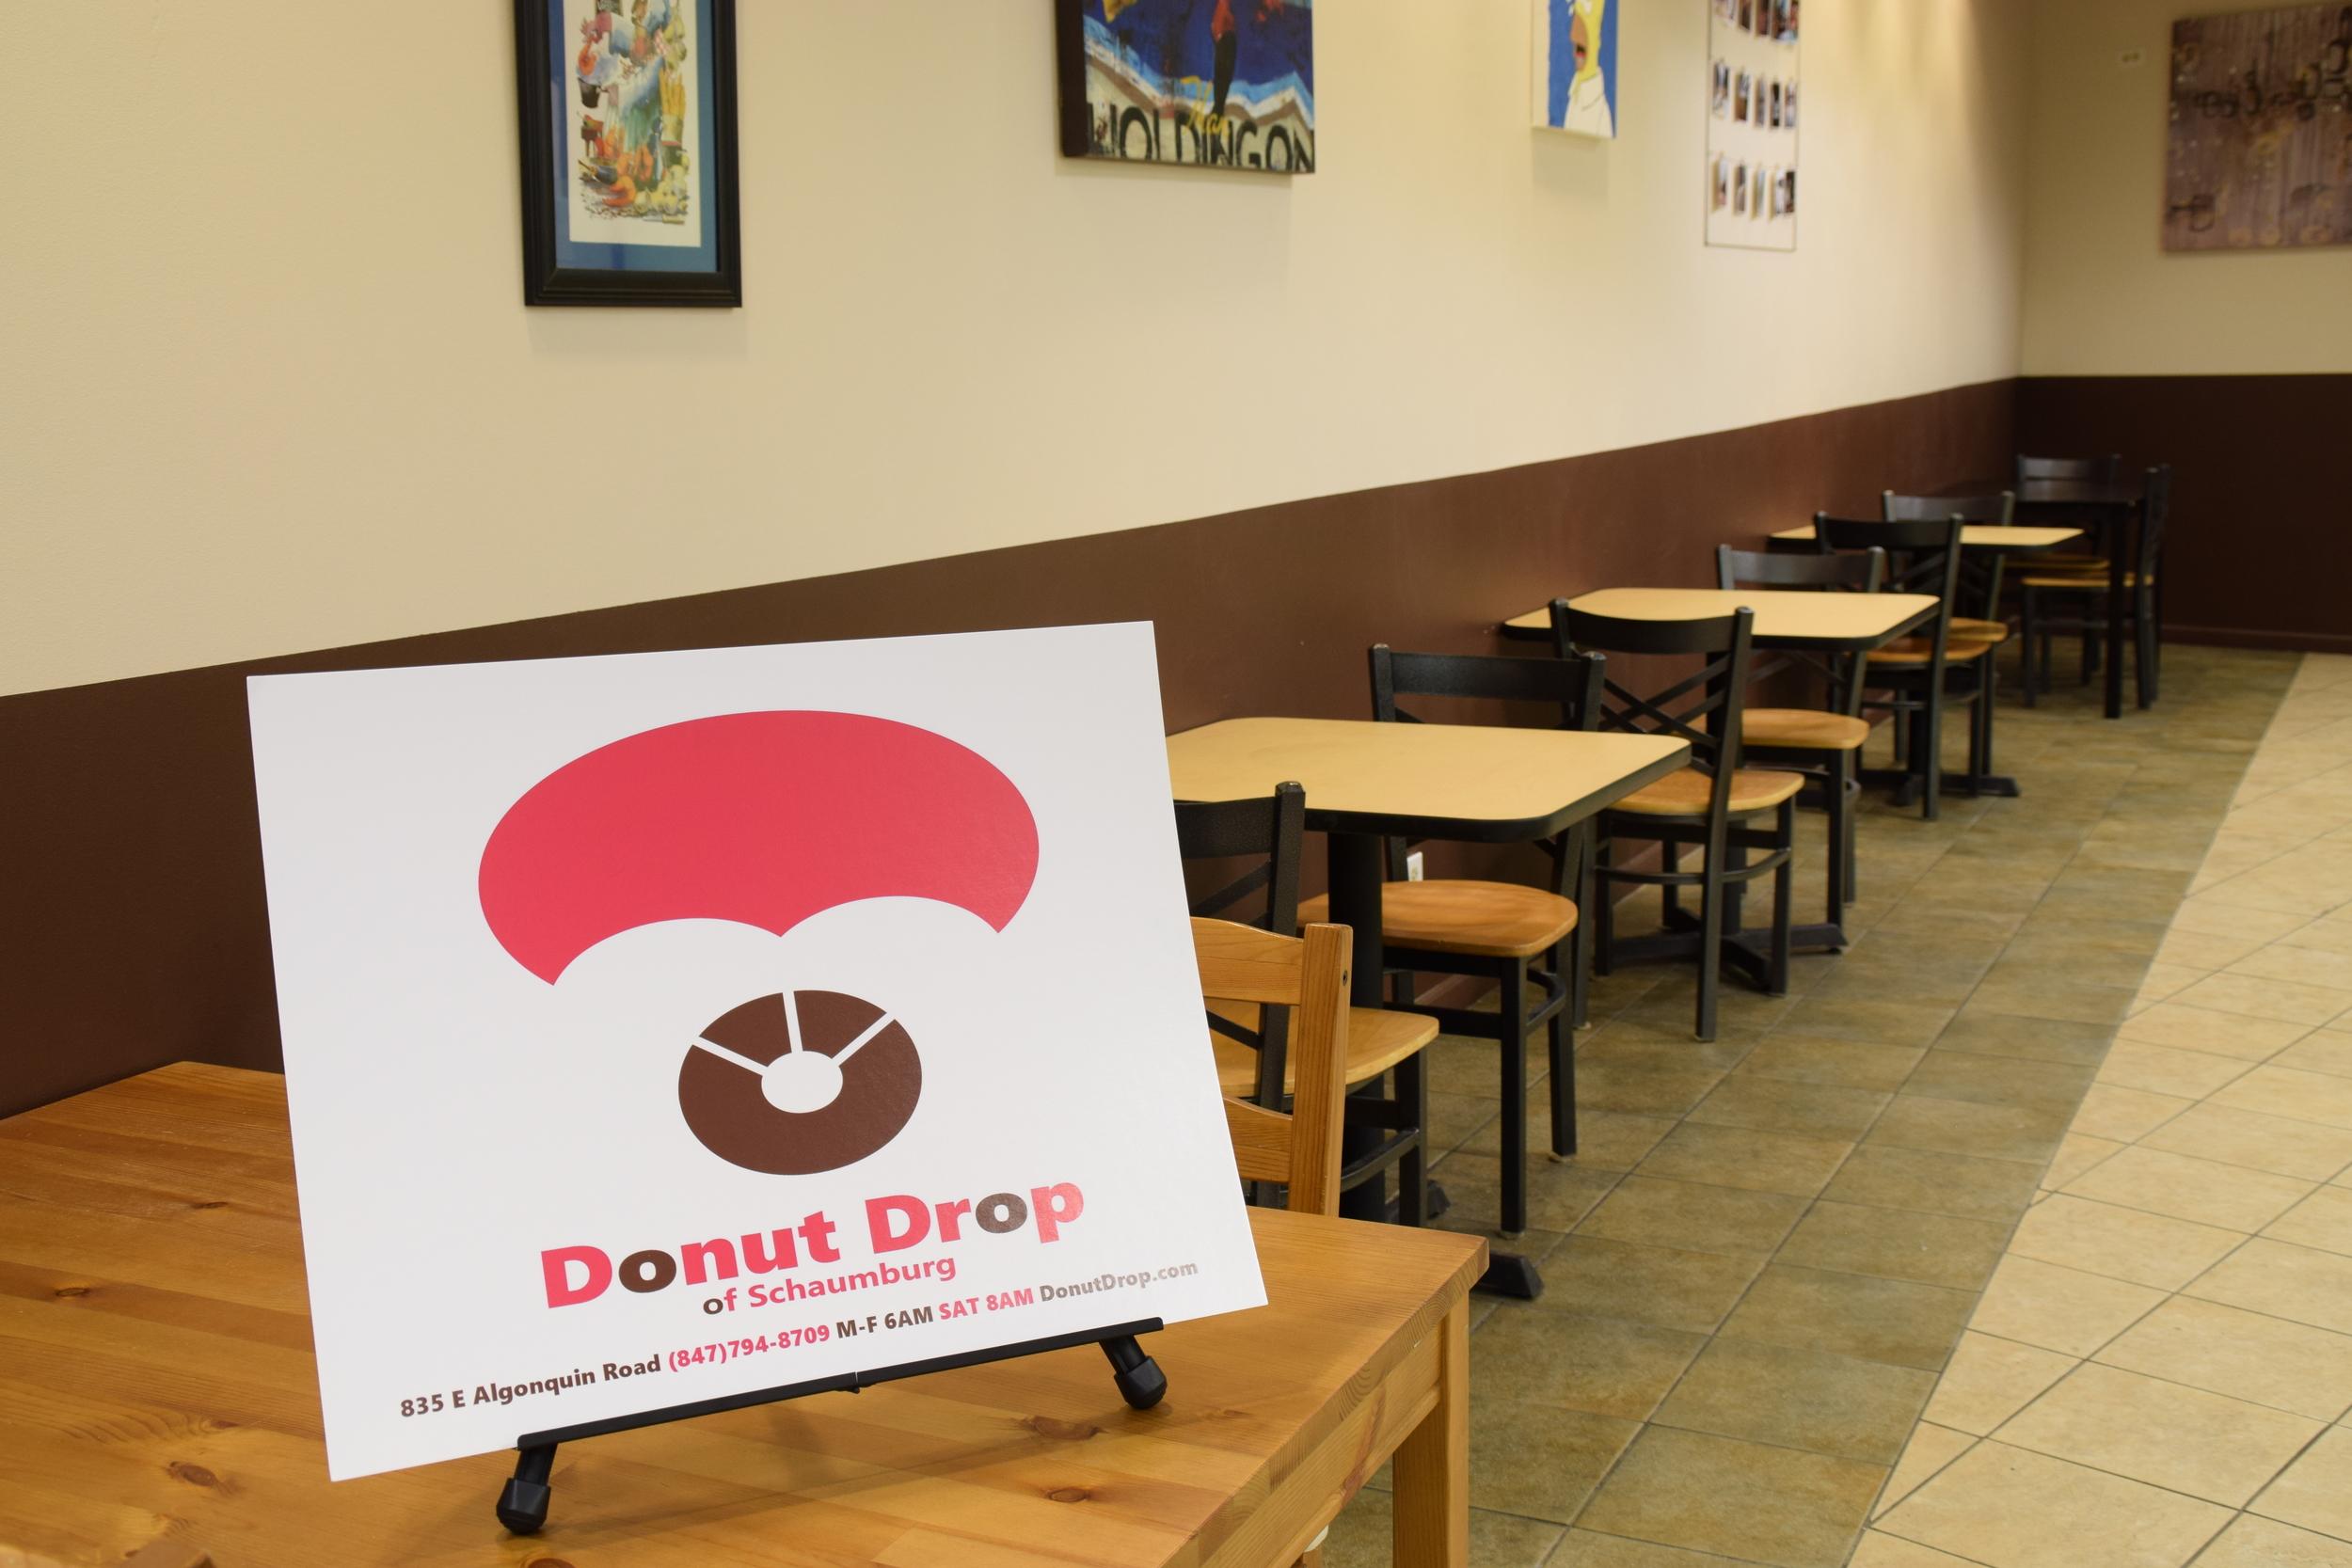 02-Donut-Drop.JPG